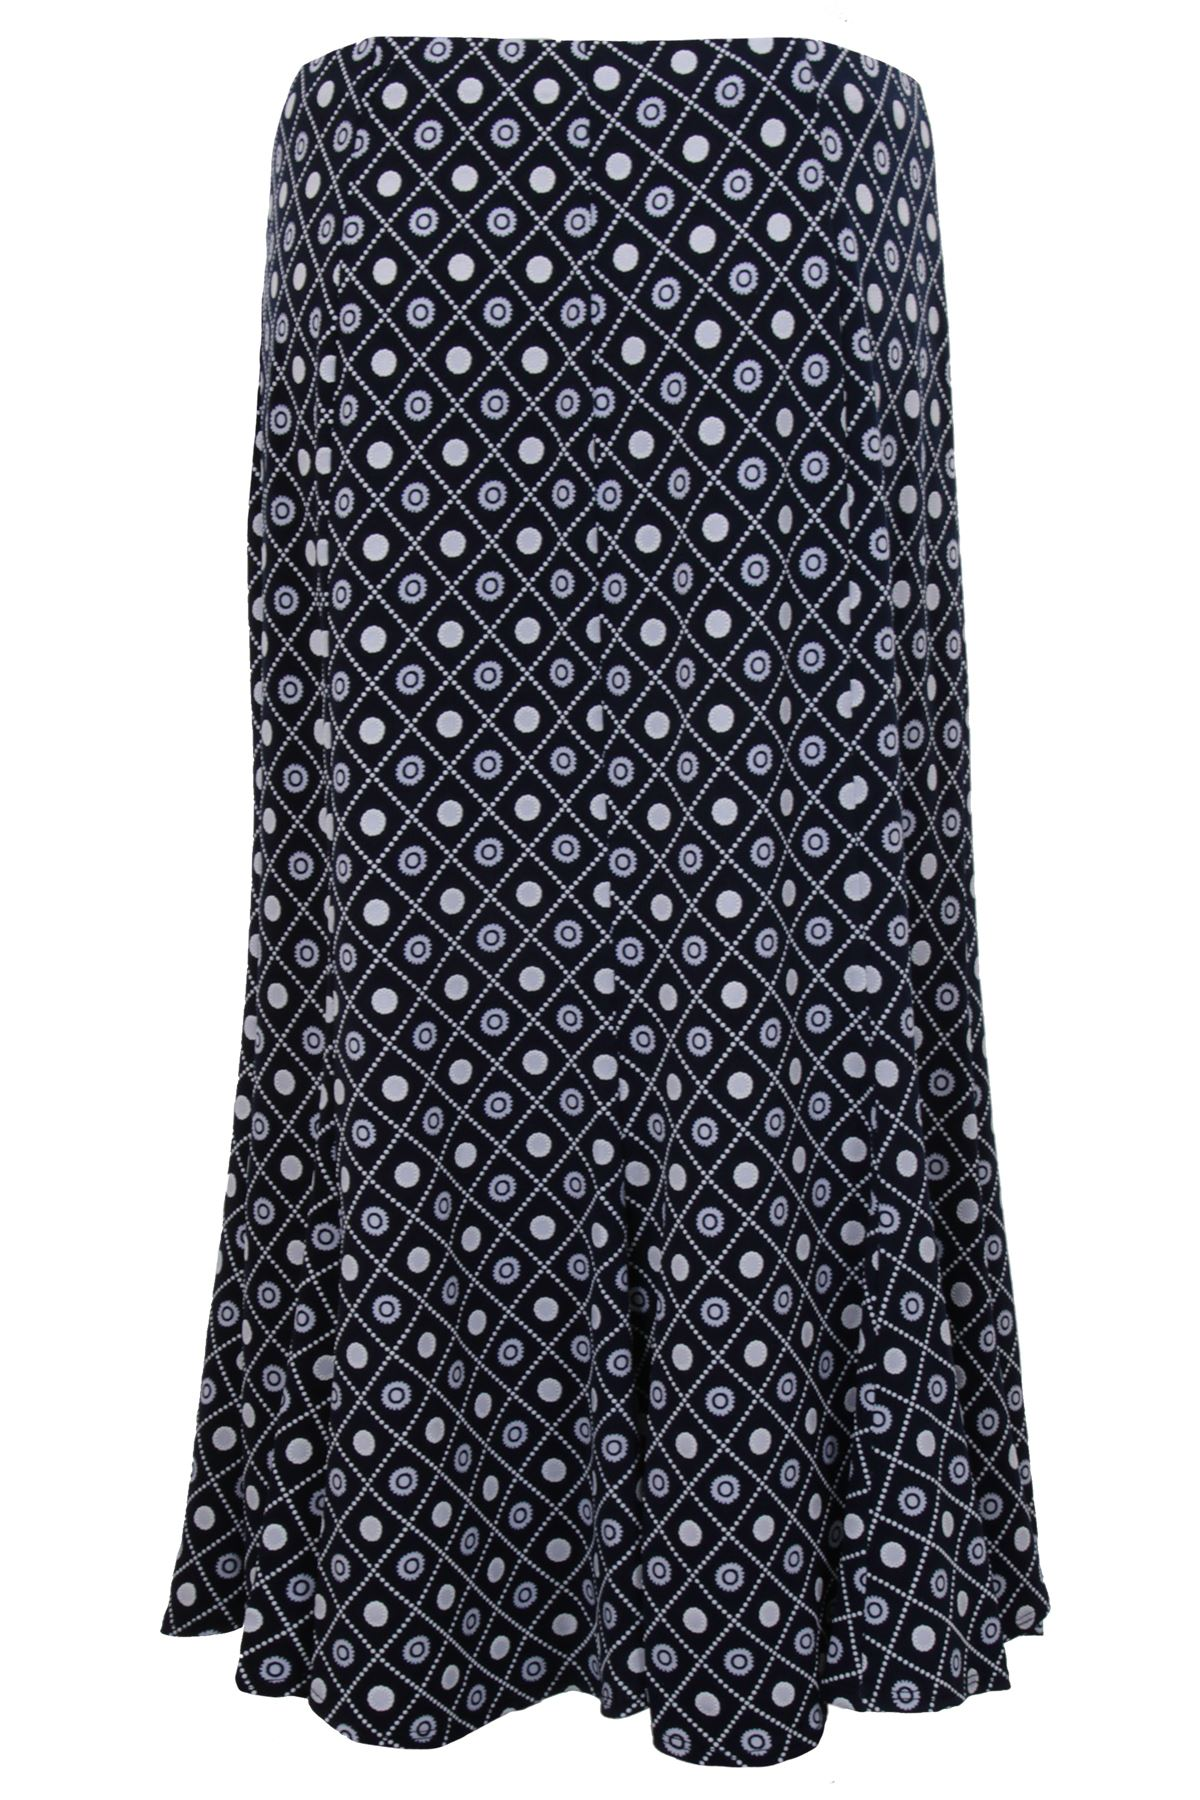 Women's Flare Lined Skirt Long Sleeve Diamond Floral Waterfall Cardi Top 2 Piece